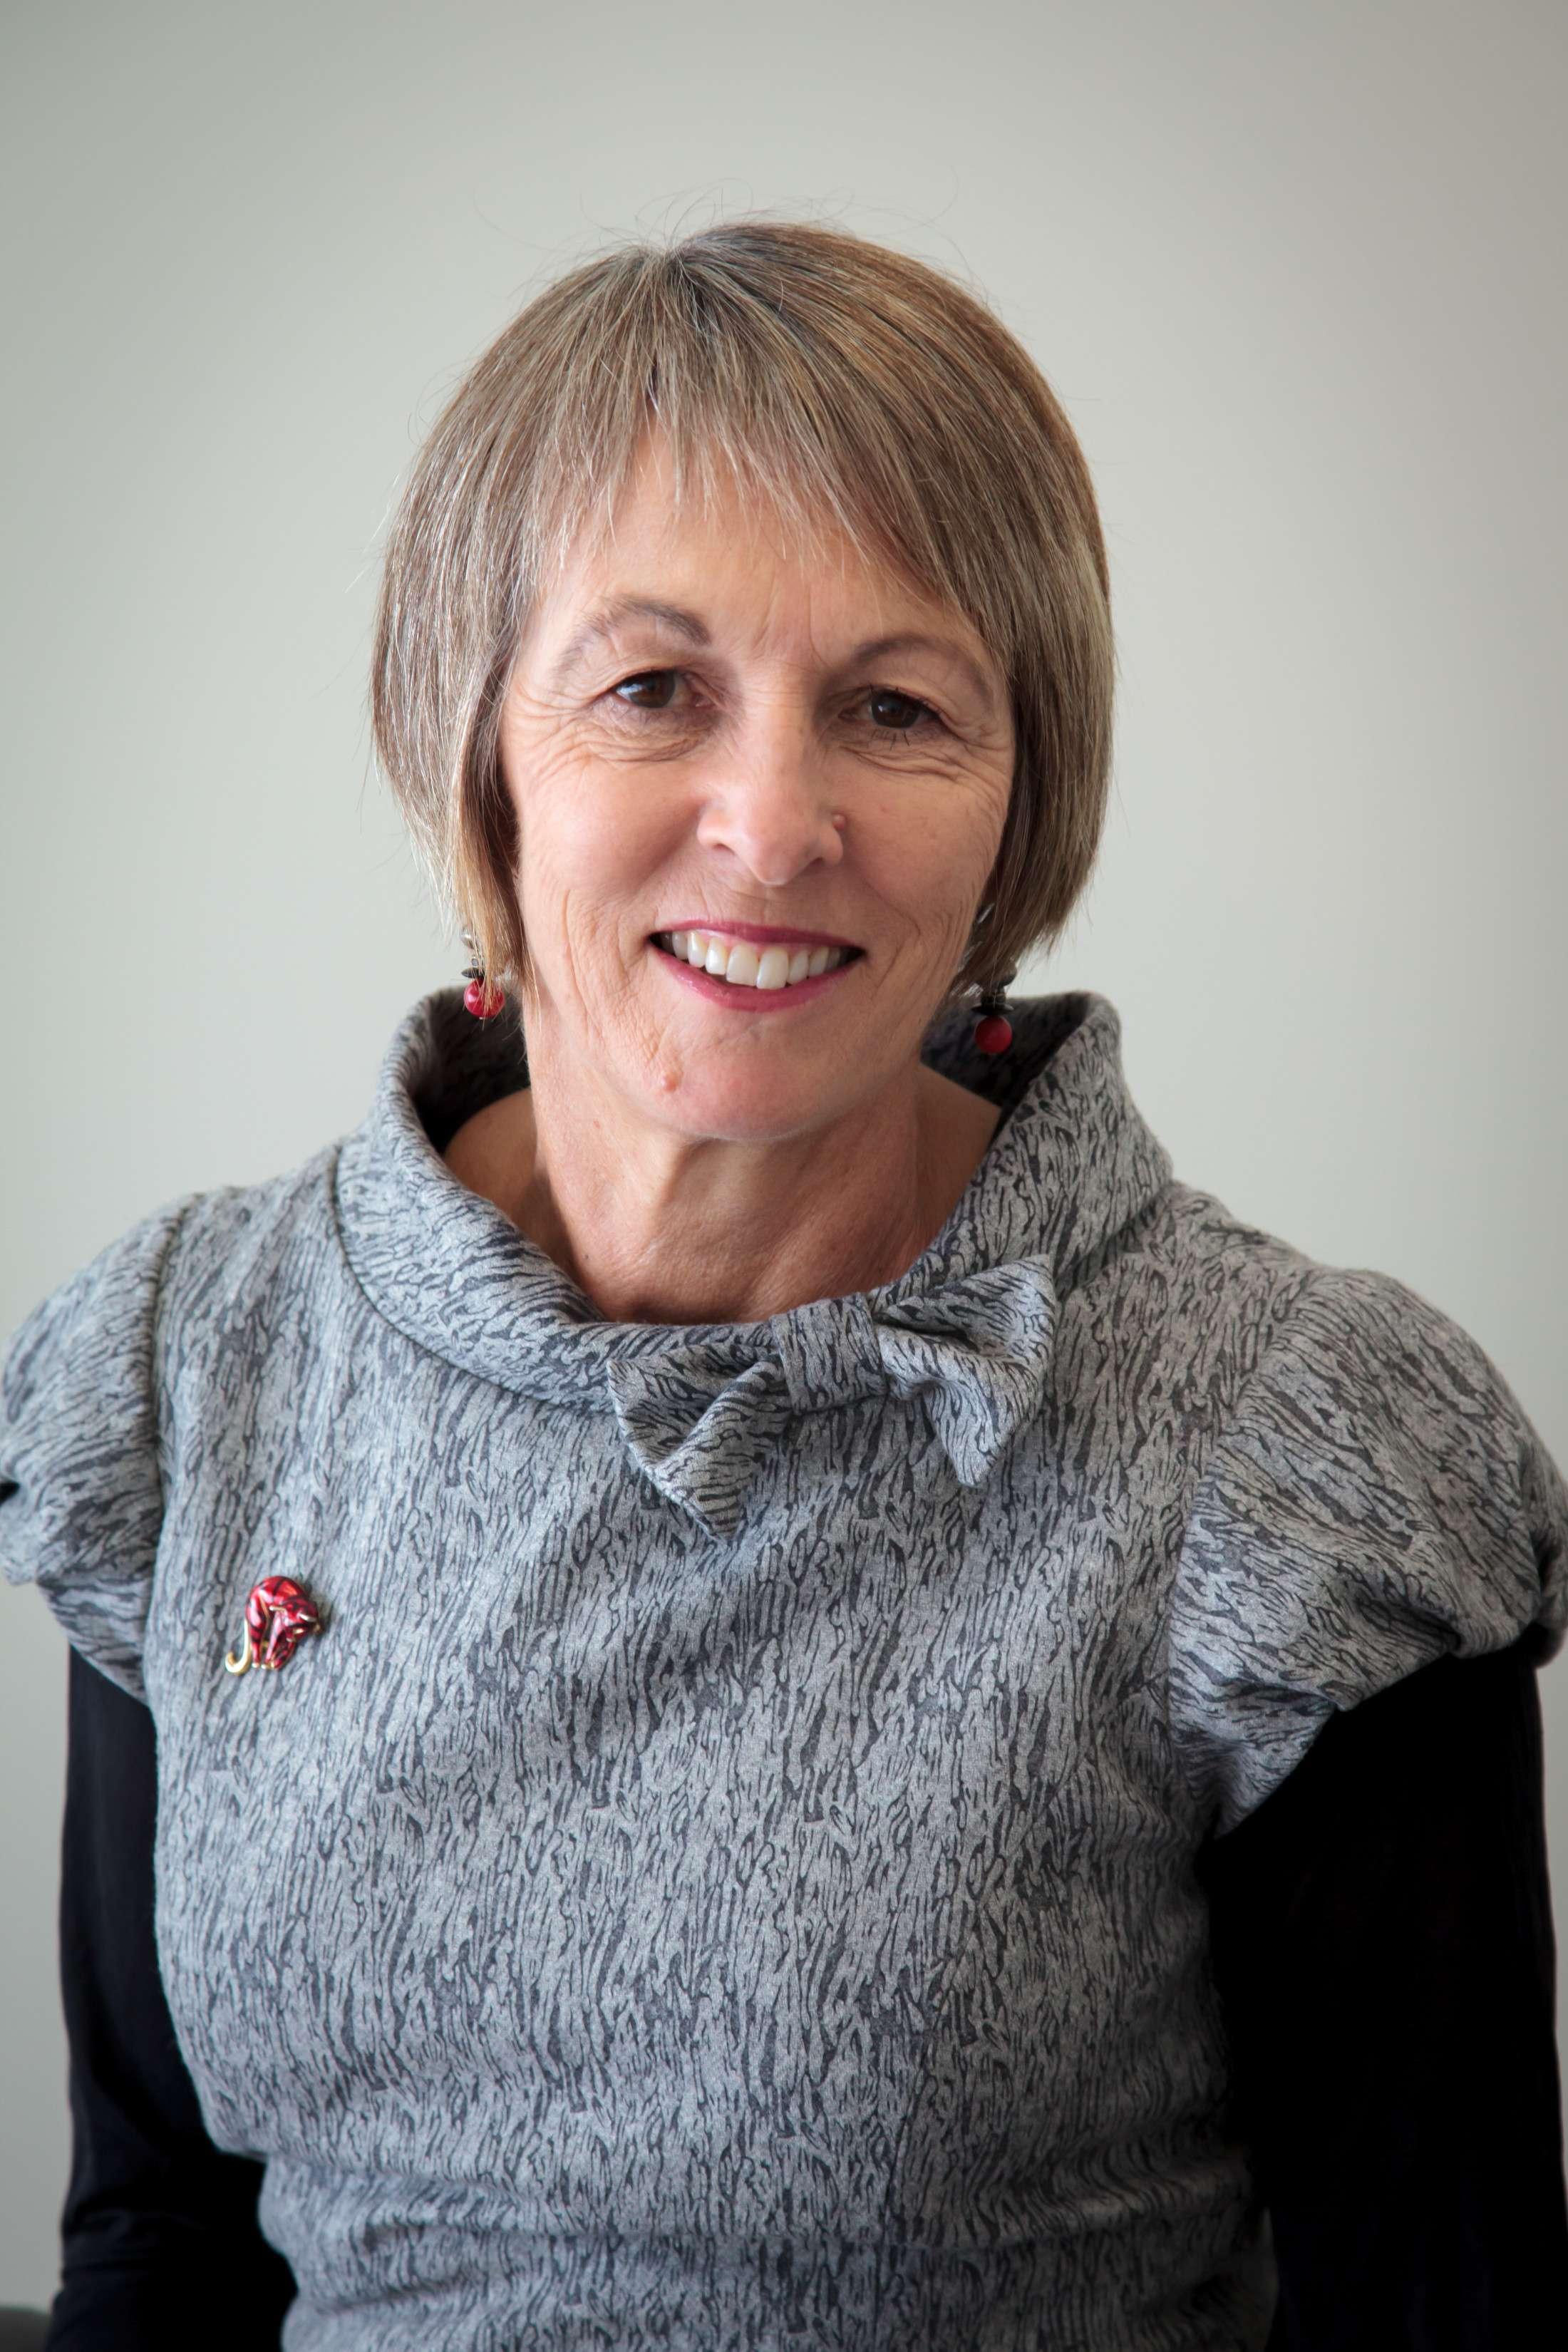 Elaine Comyn